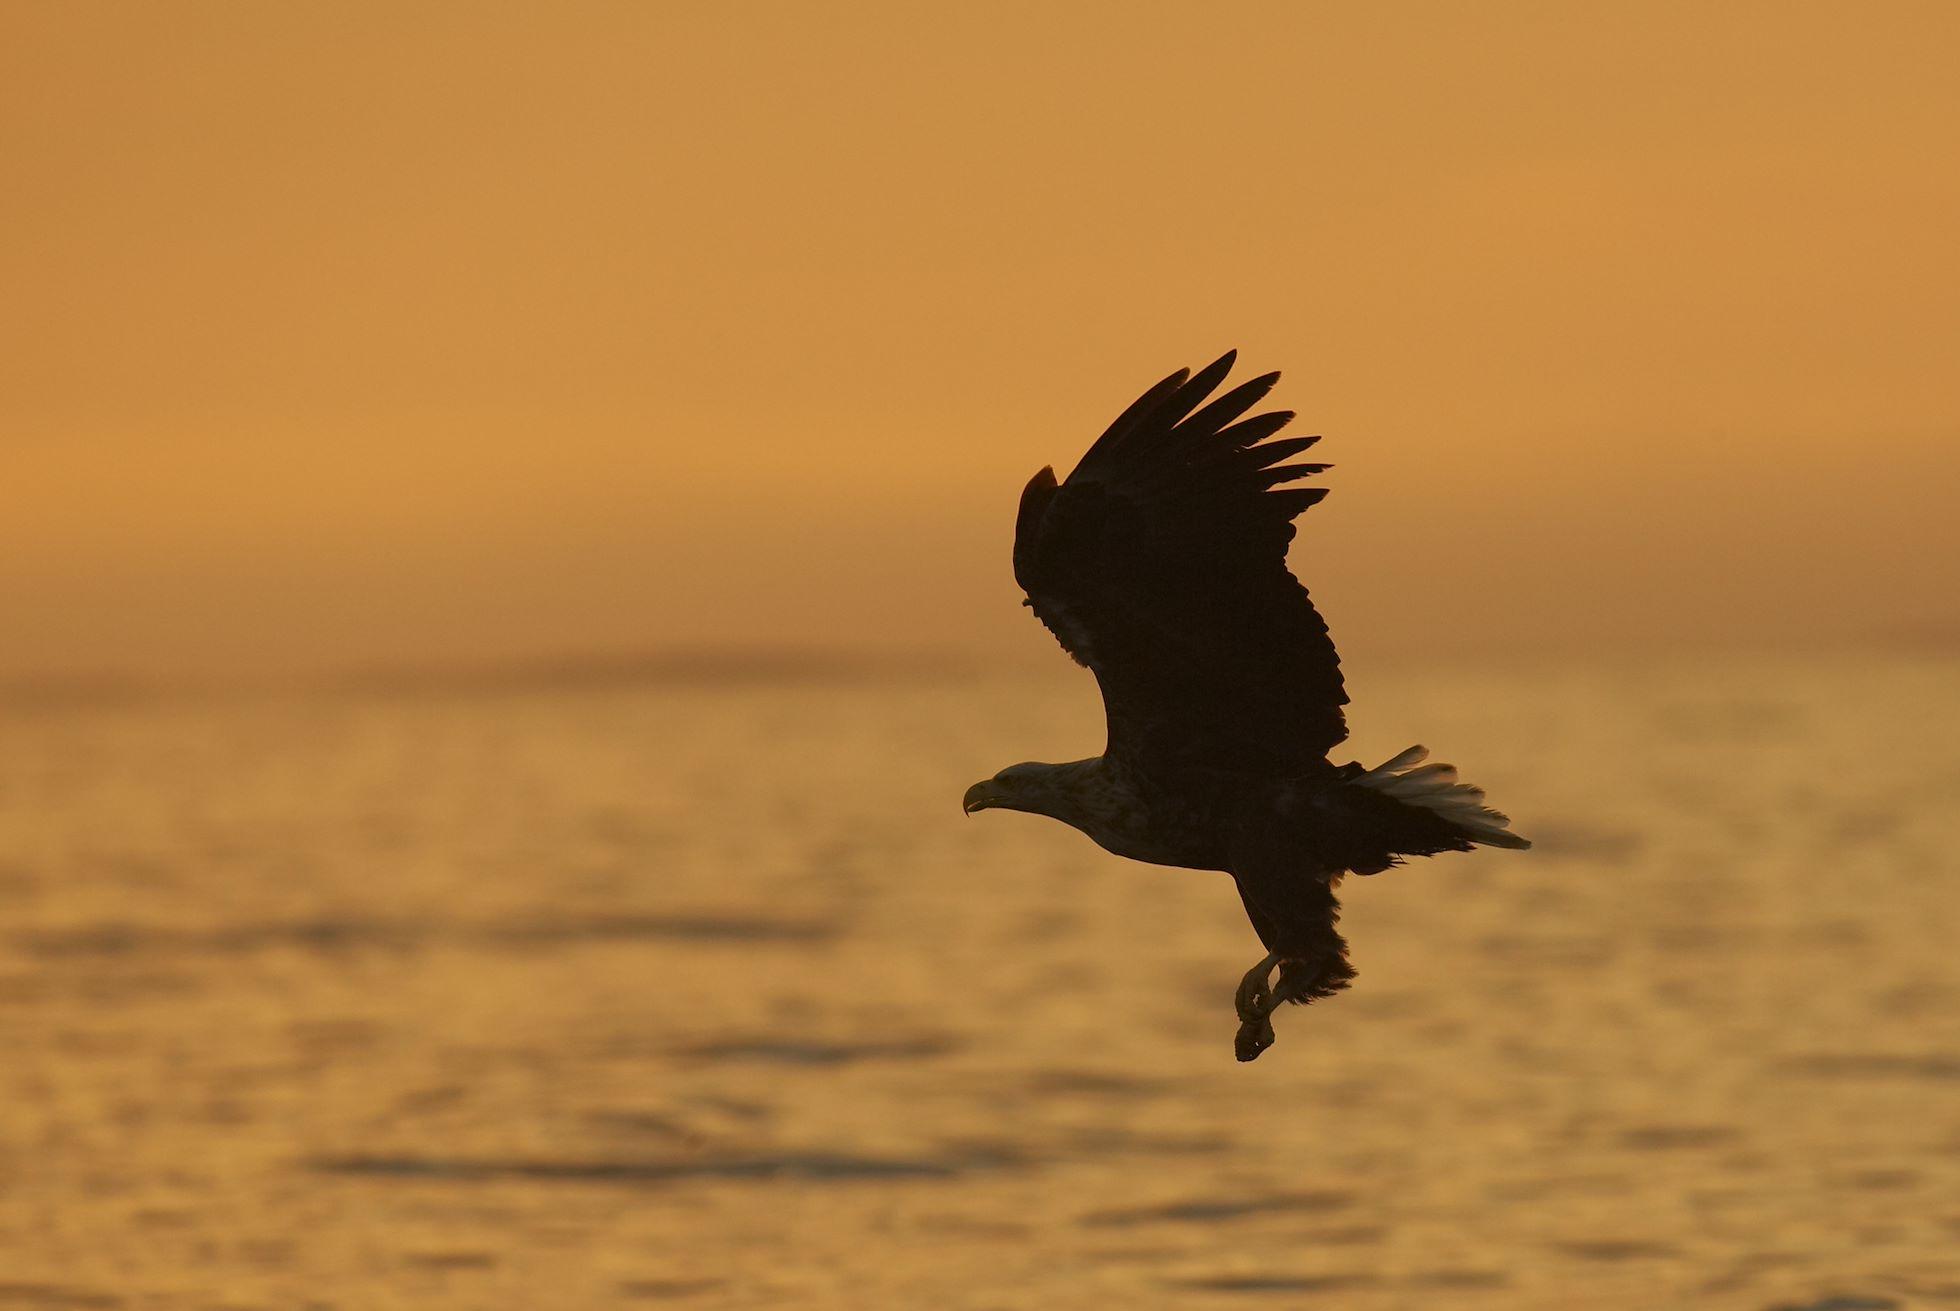 Sea eagle (Haliaeetus albicilla) in flight silhouetted against sunset, Flatanger, Norway